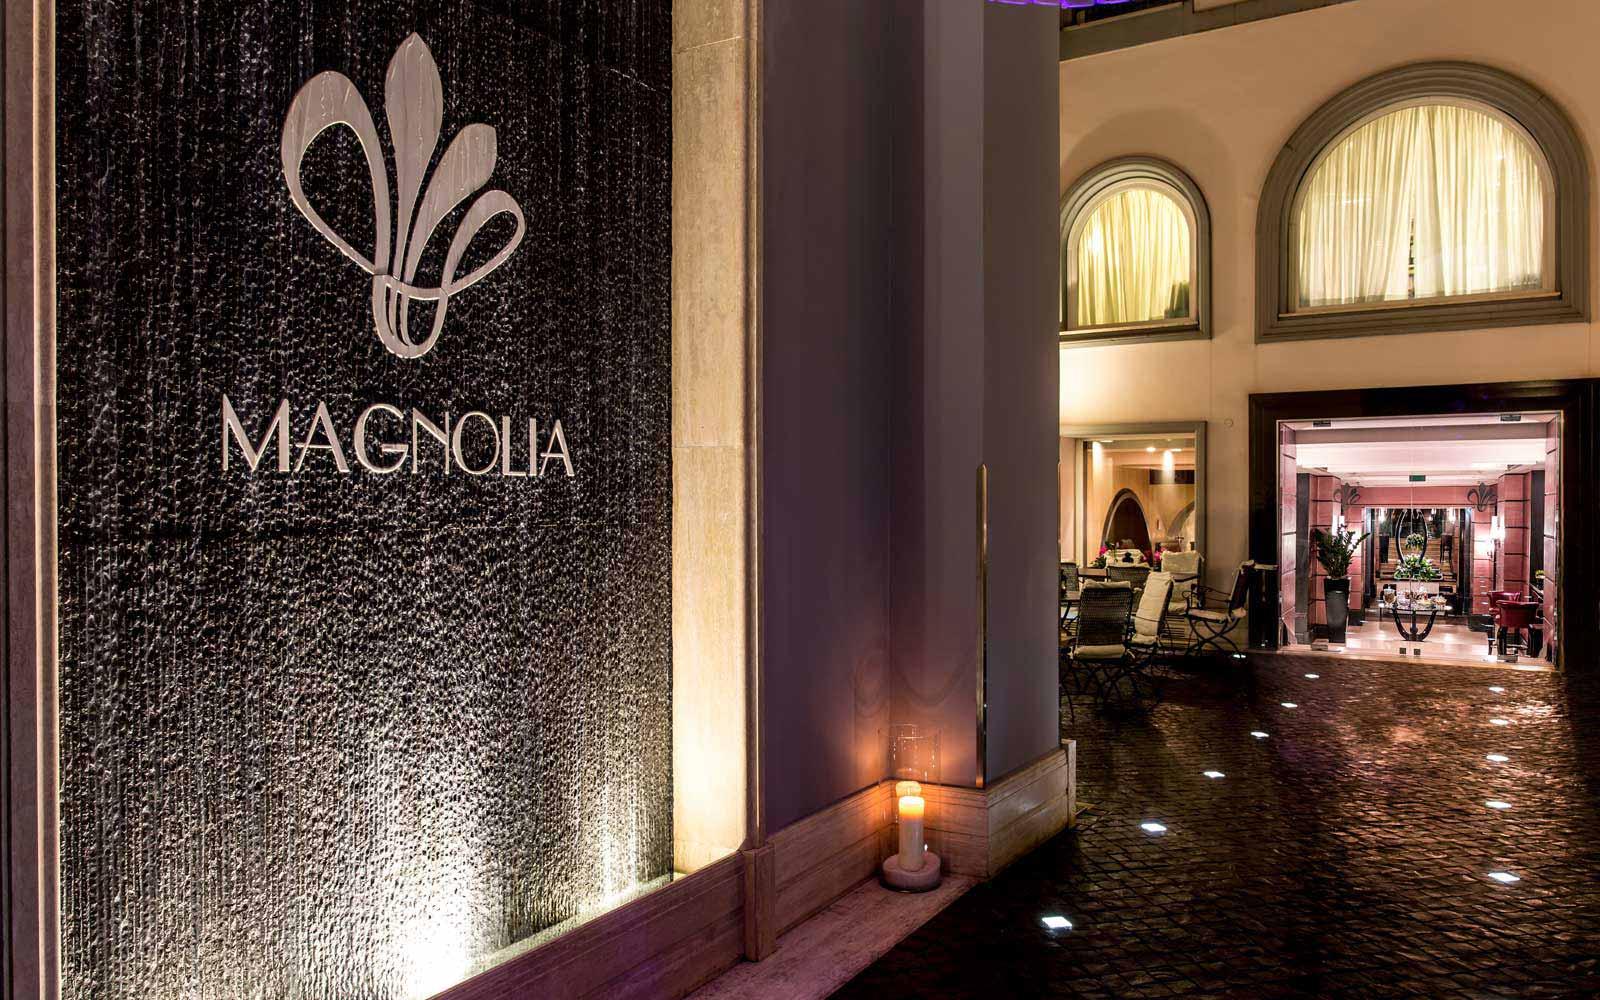 Magnolia entrance at the Grand Hotel Via Veneto